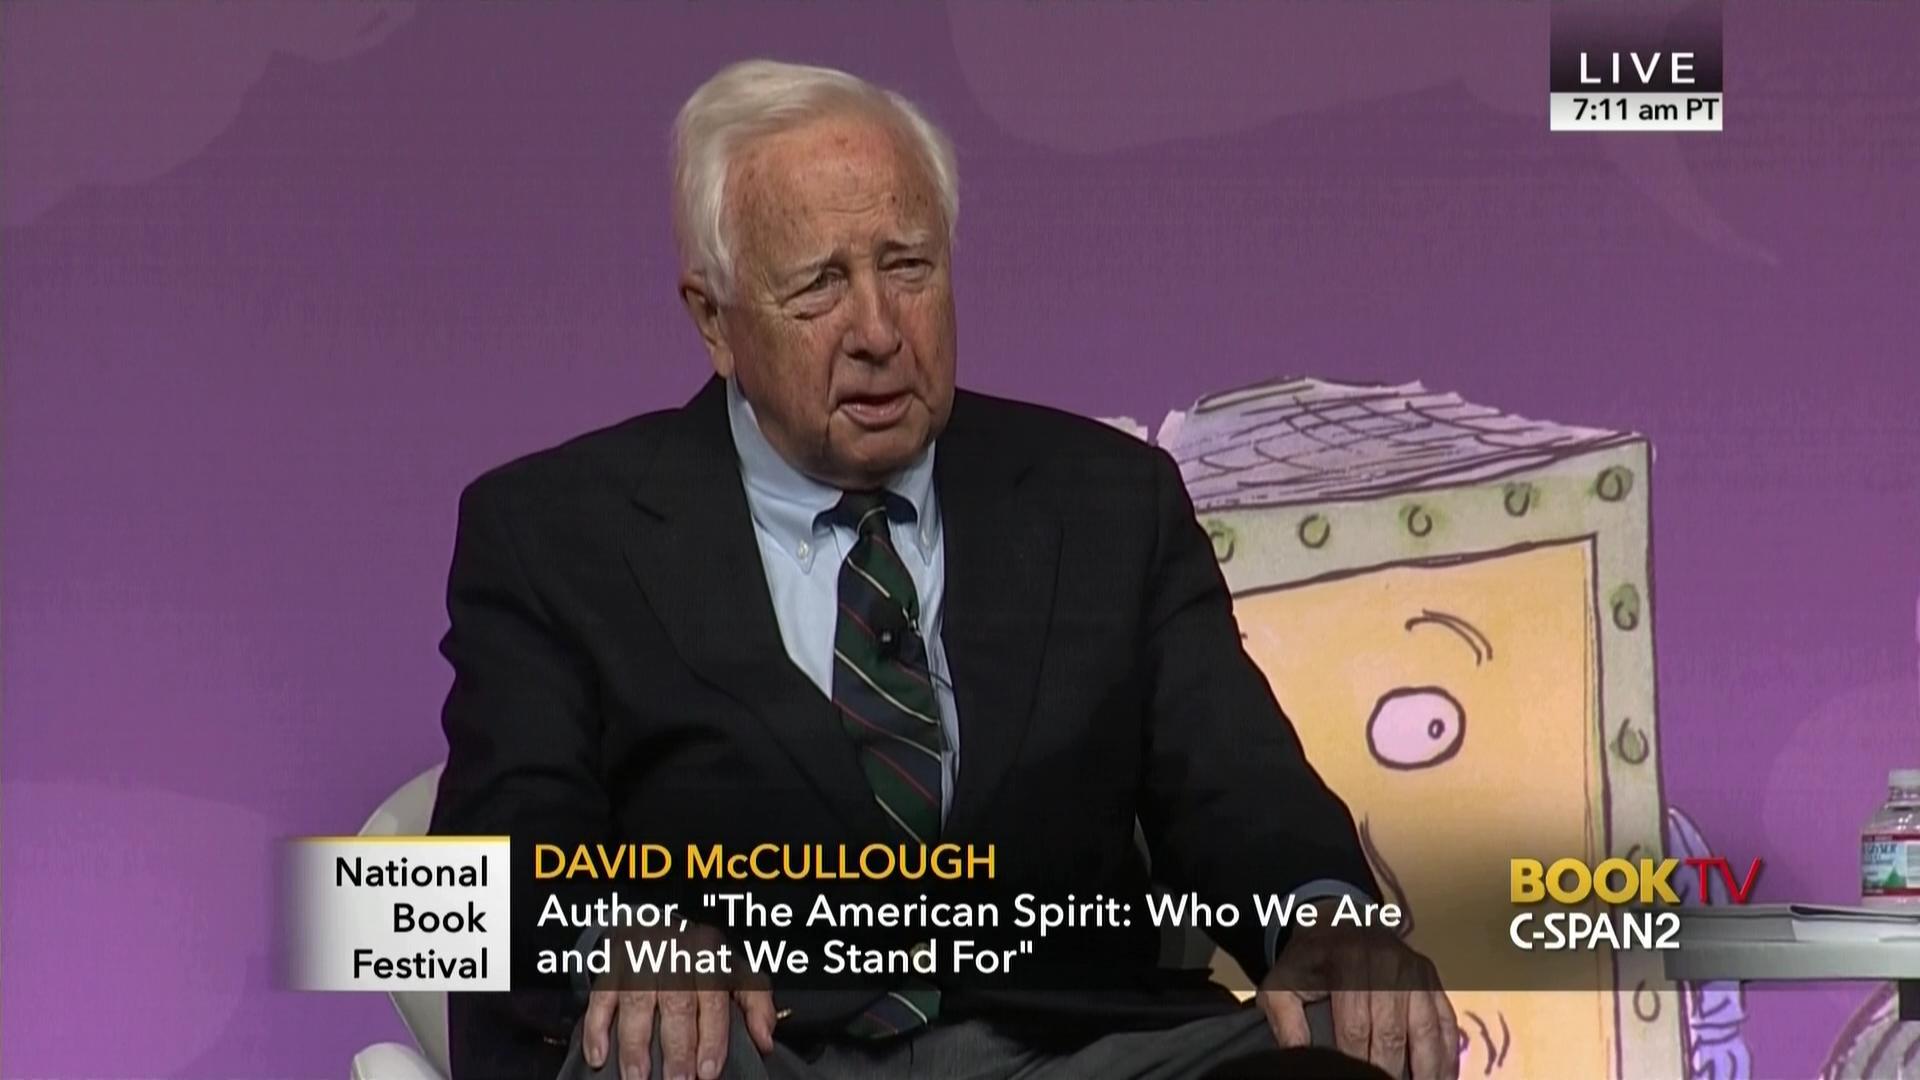 Historian David McCullough Discusses American Spirit, Sep 2 2017 |  C-SPAN.org